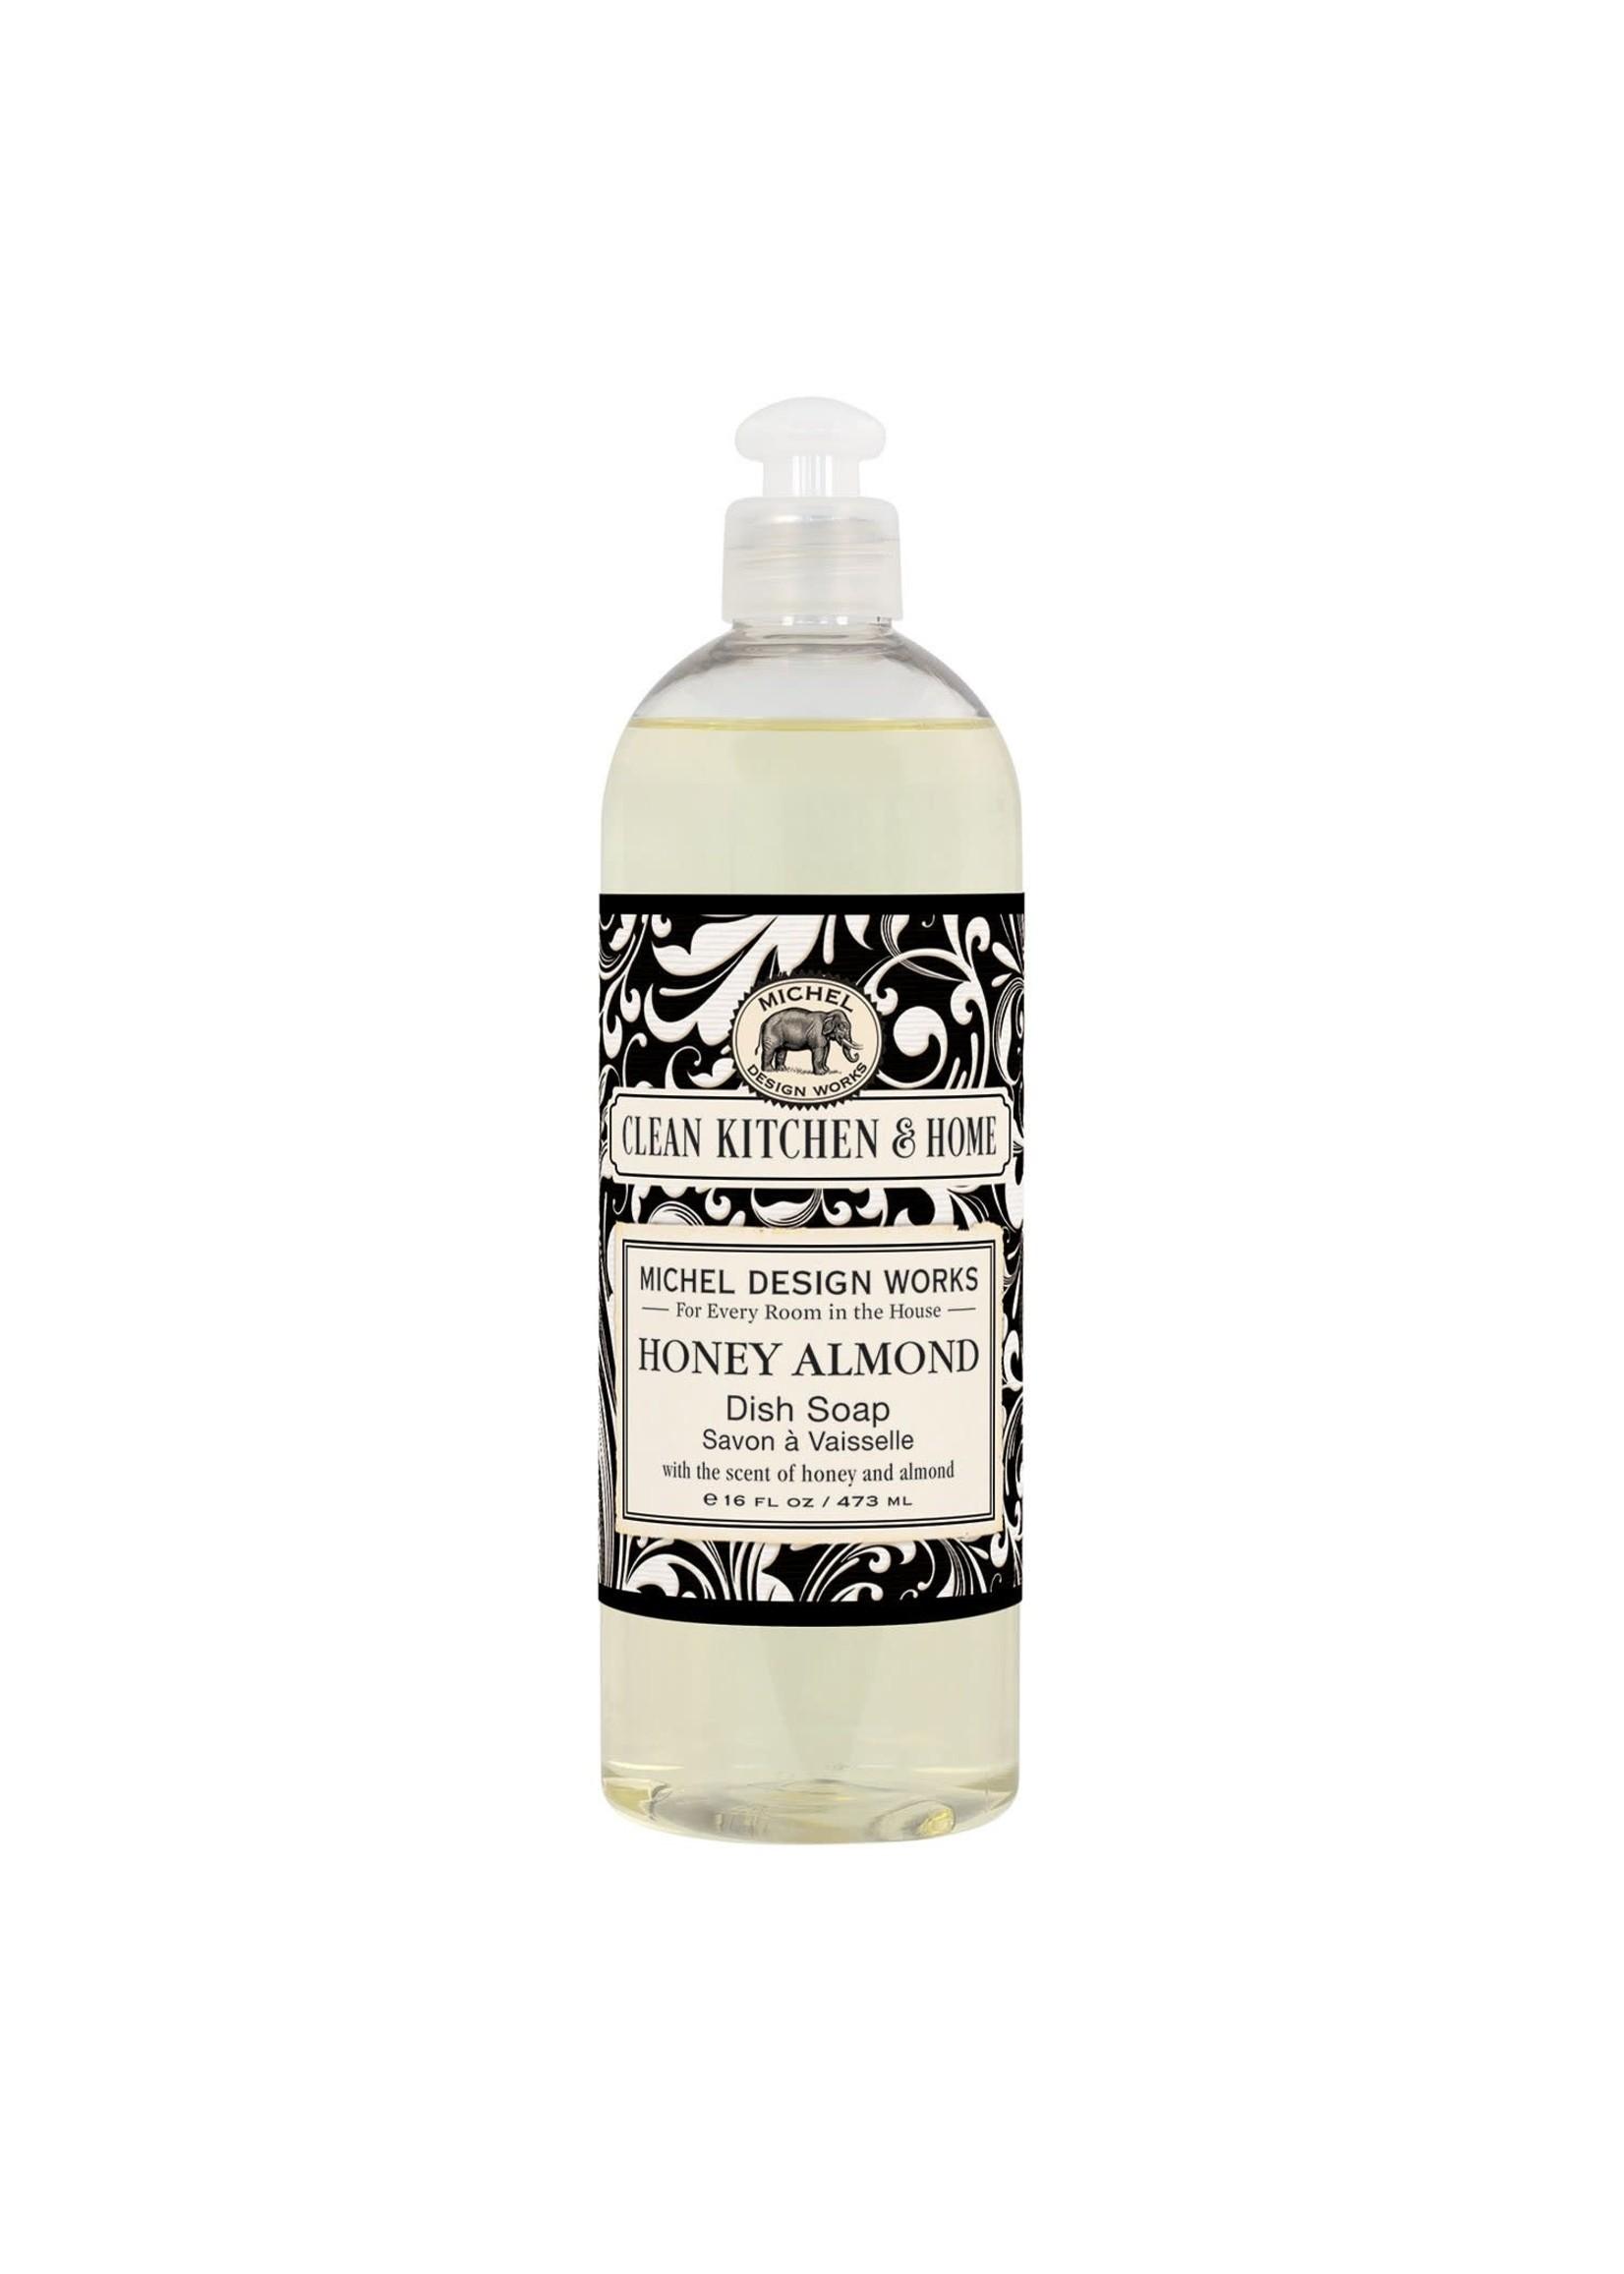 HONEY ALMOND DISH SOAP